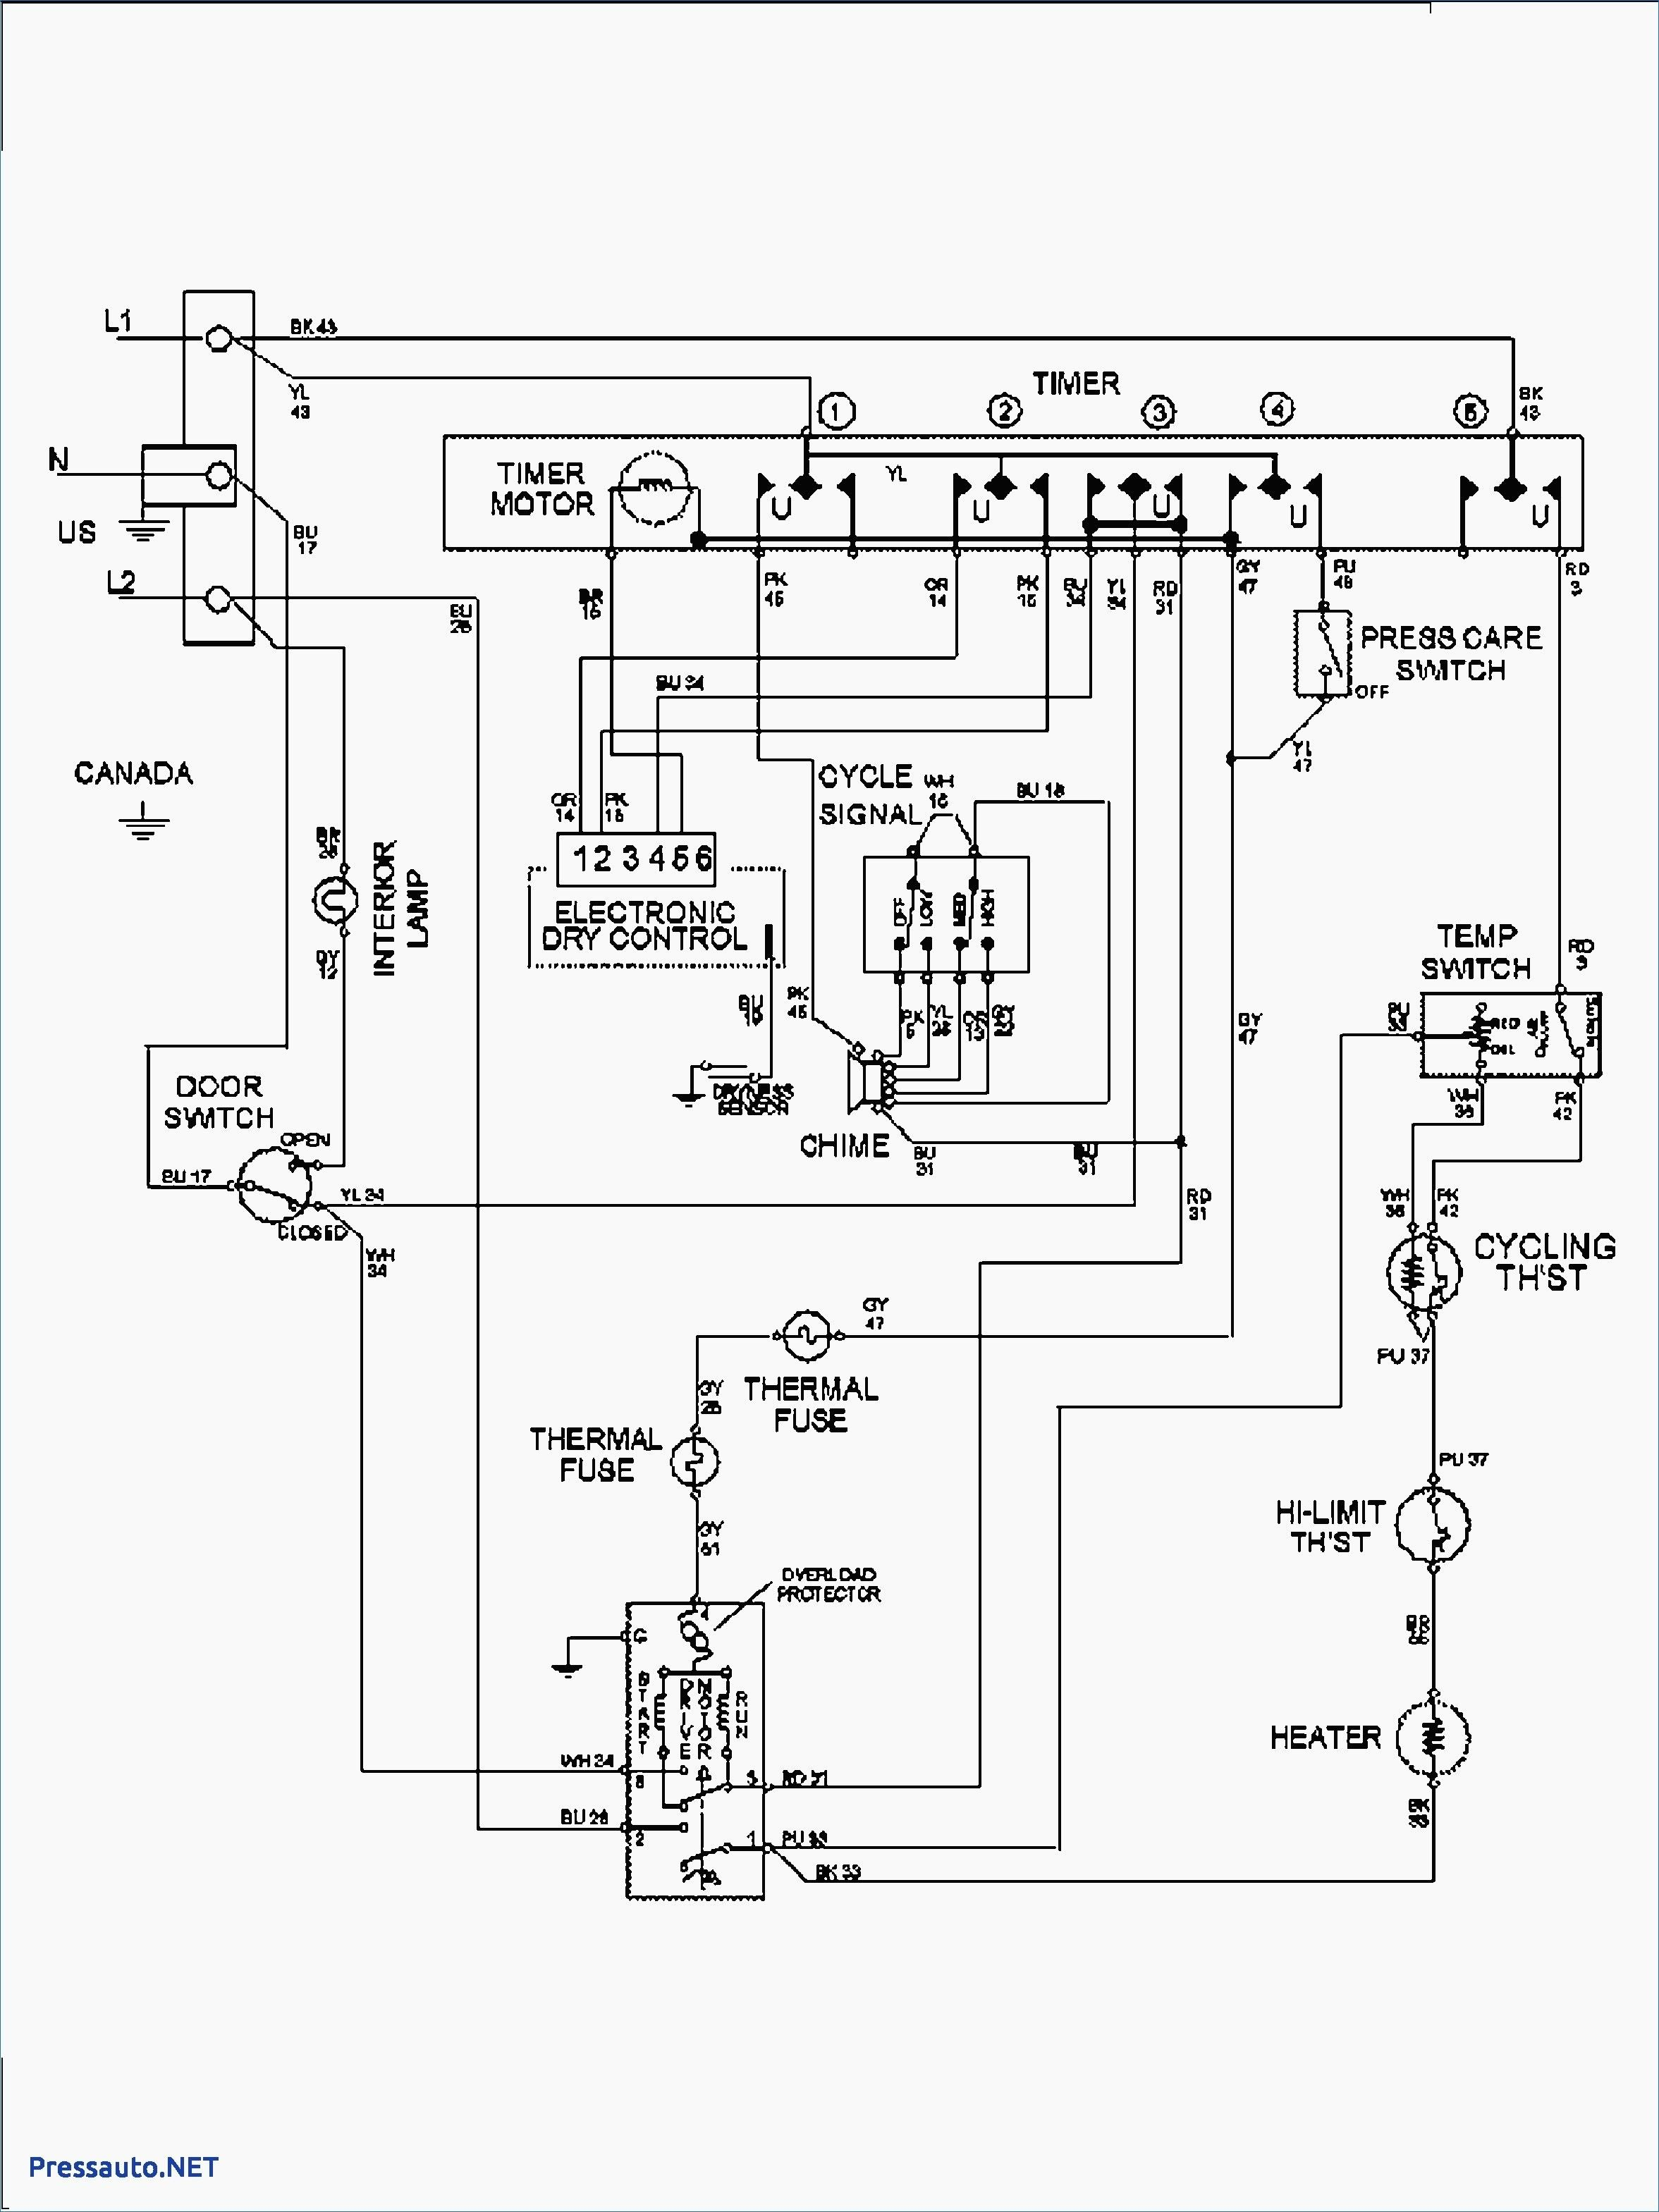 Modra Generator Wiring Diagram